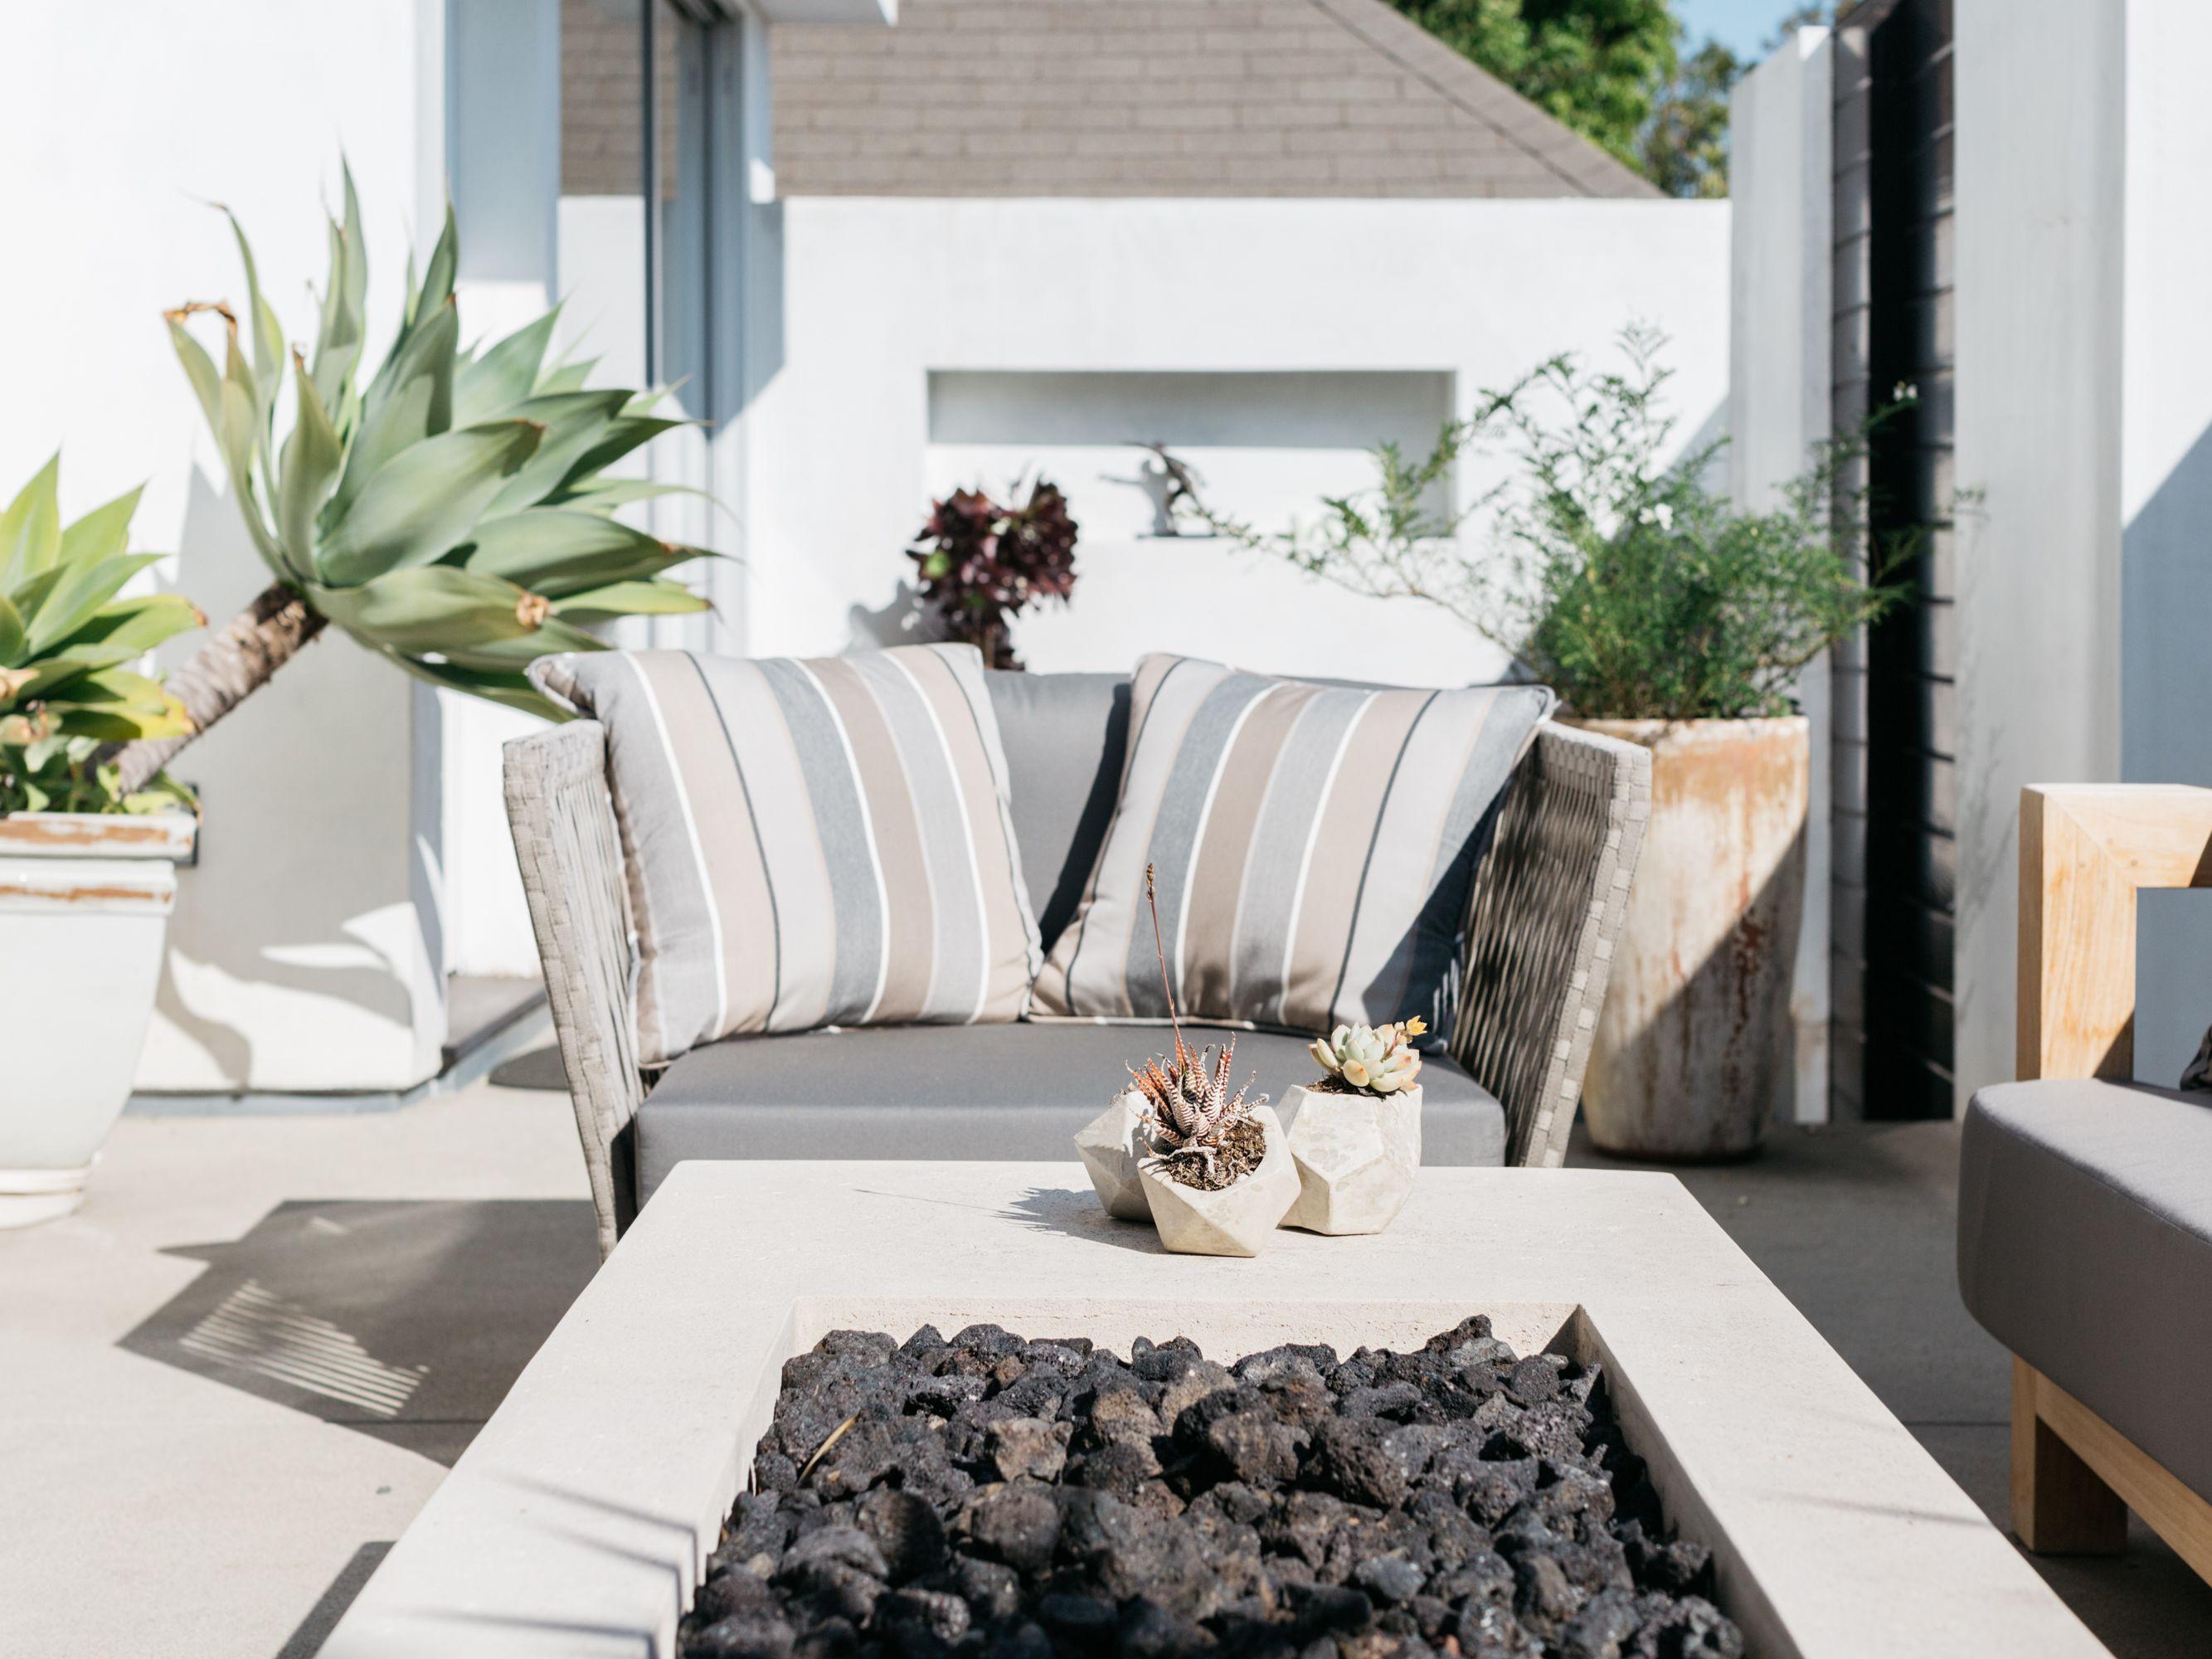 10 creative and inexpensive diy patios